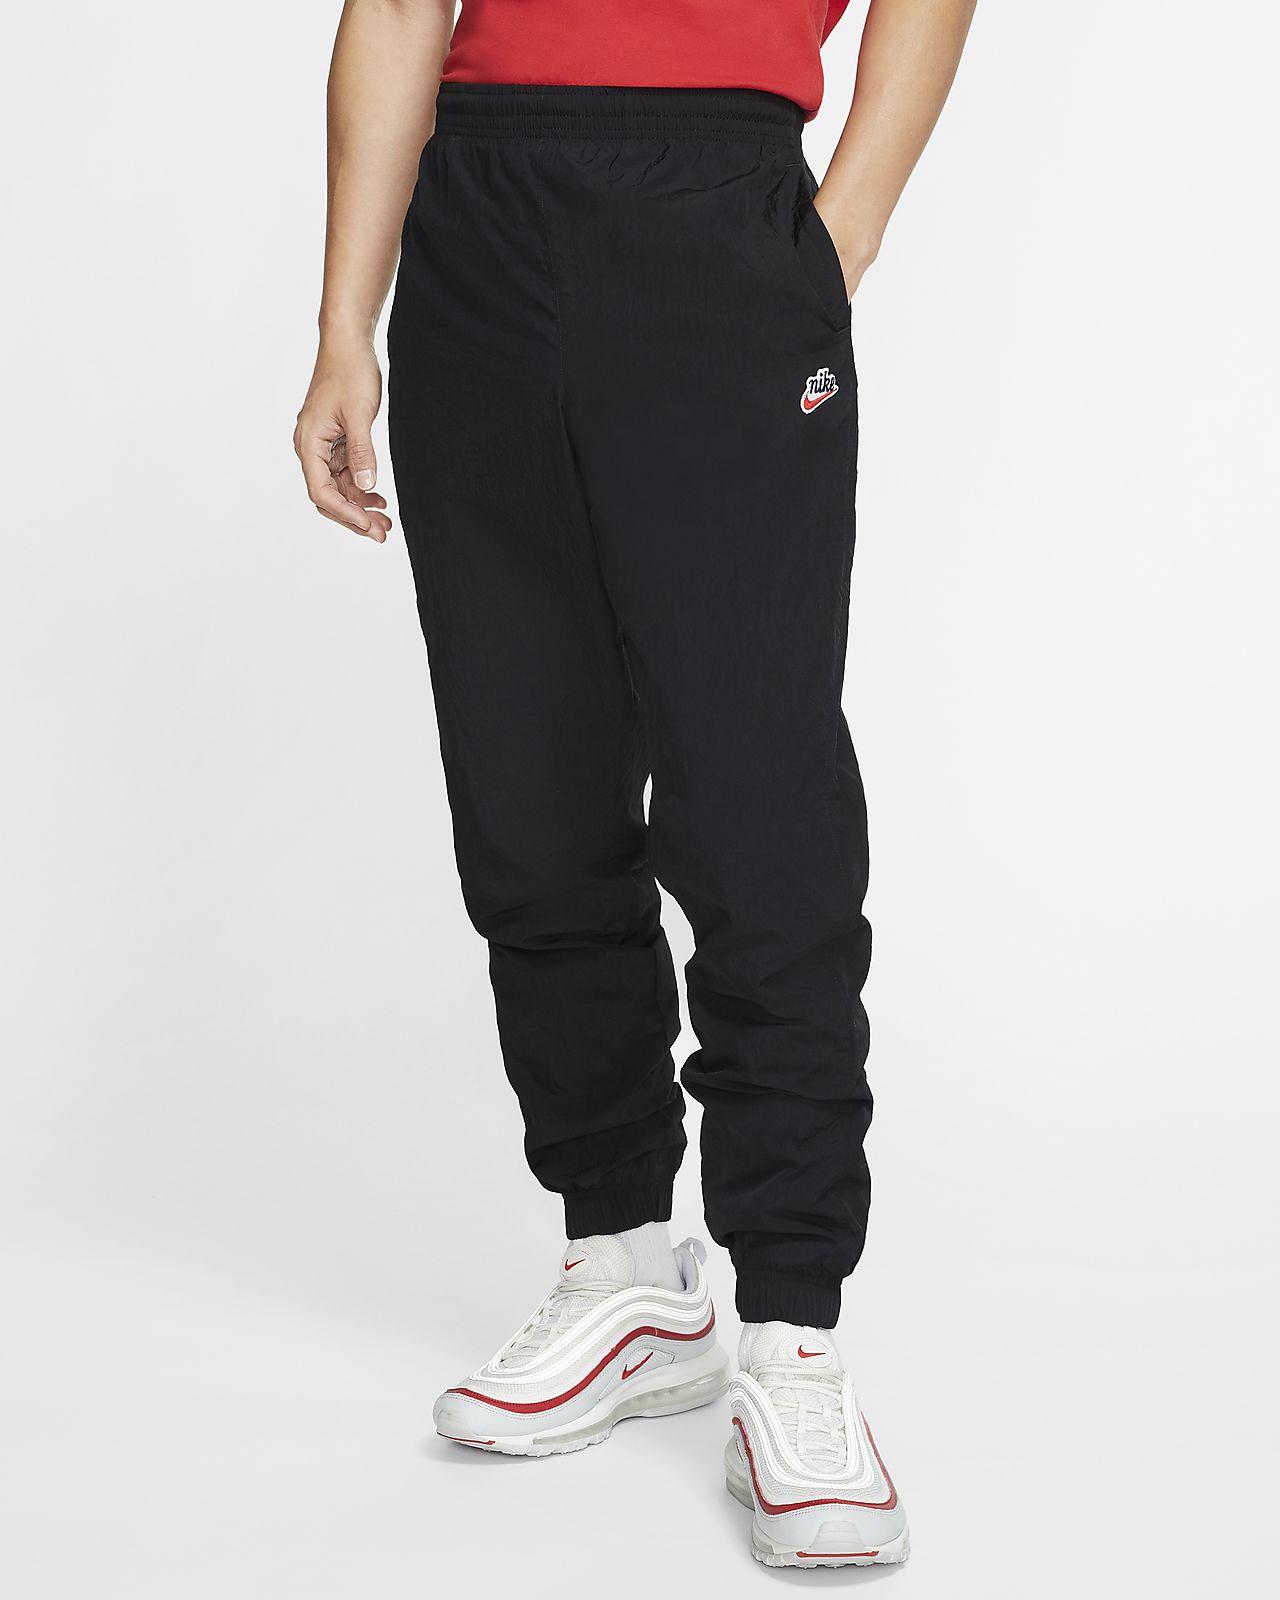 Pantaloni in woven Nike Sportswear Windrunner - Uomo